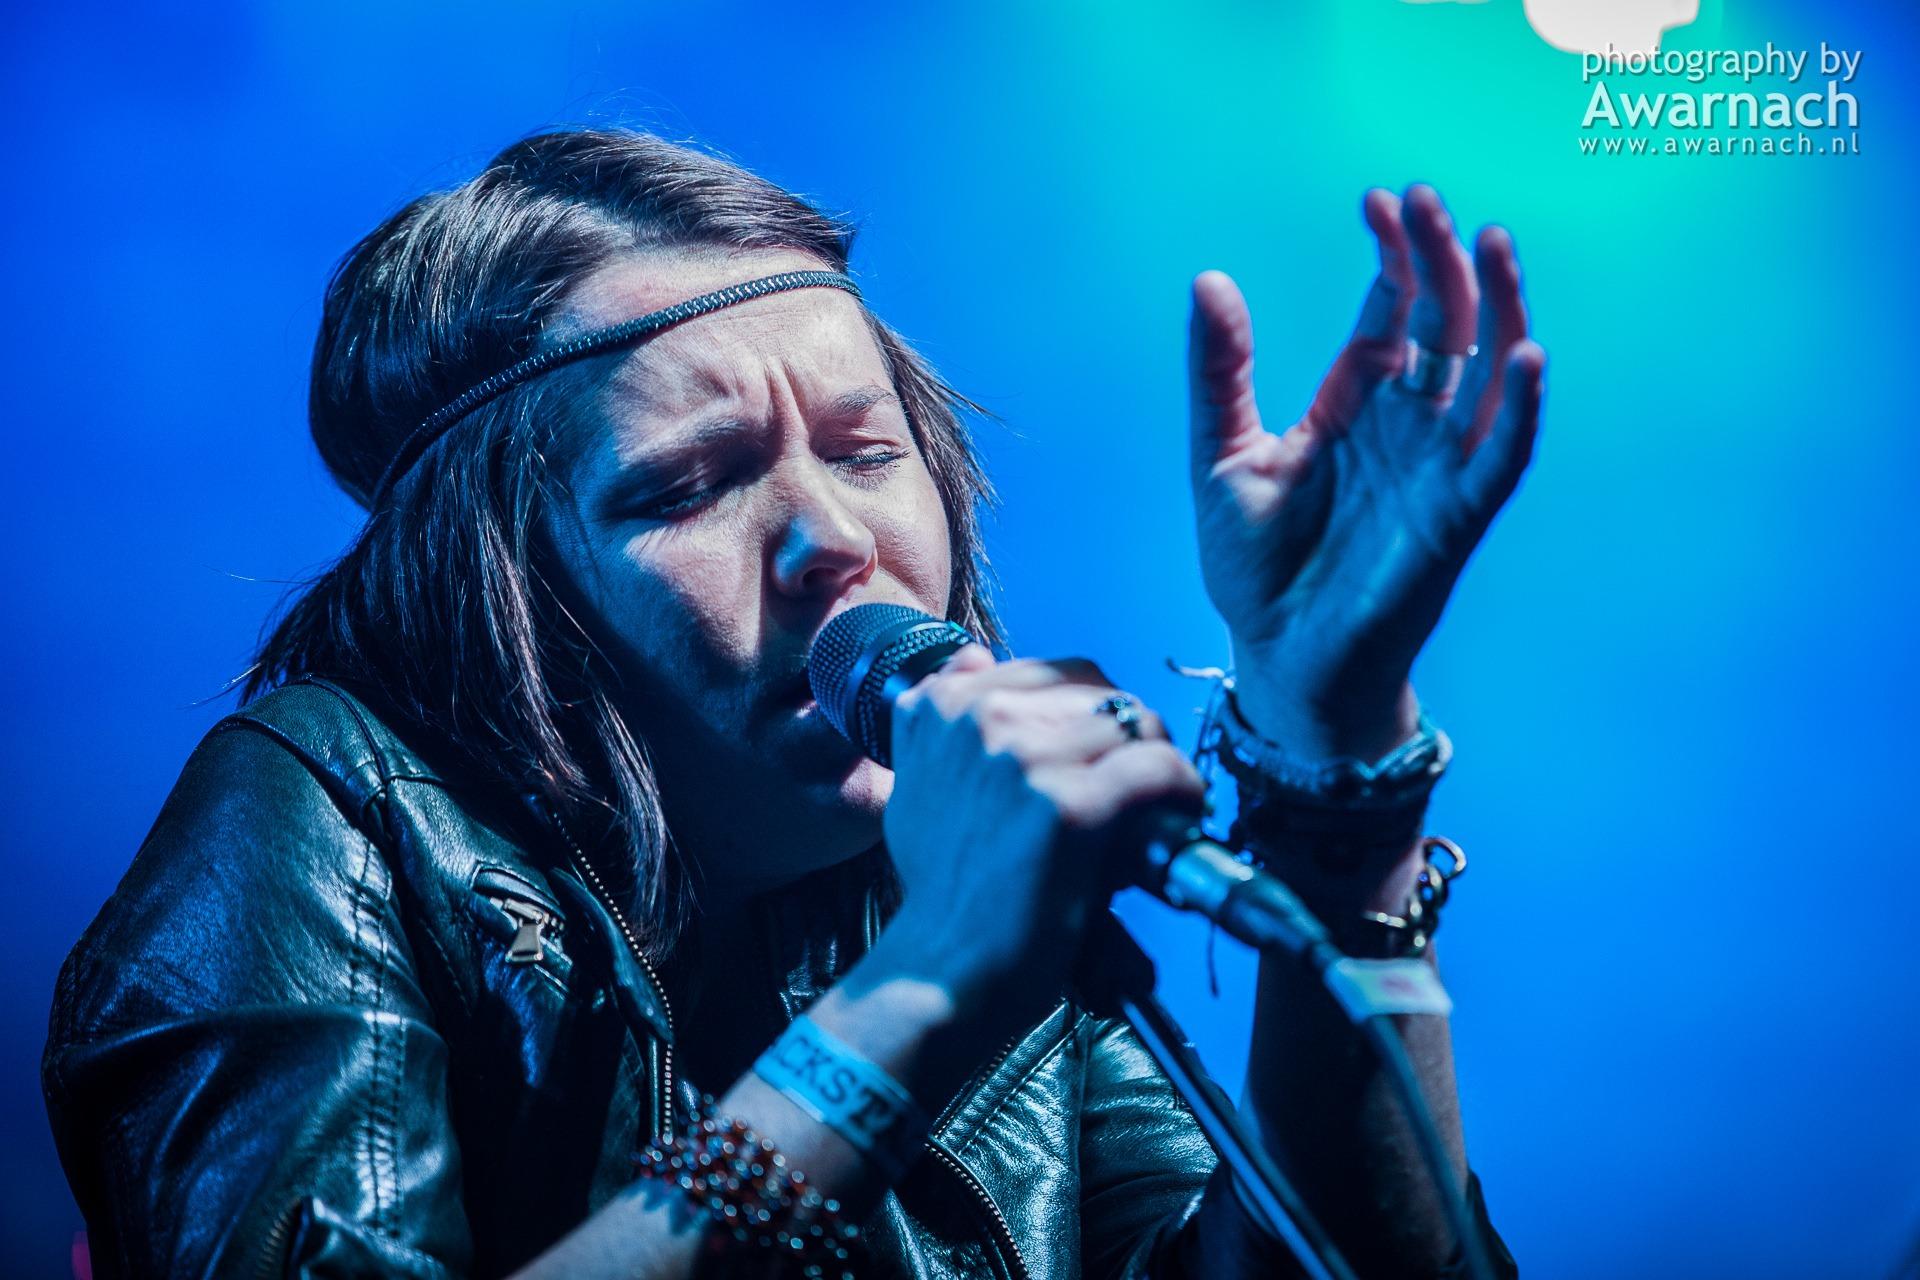 Maggie and the Jar @ Hoornse Stadsfeesten 2014